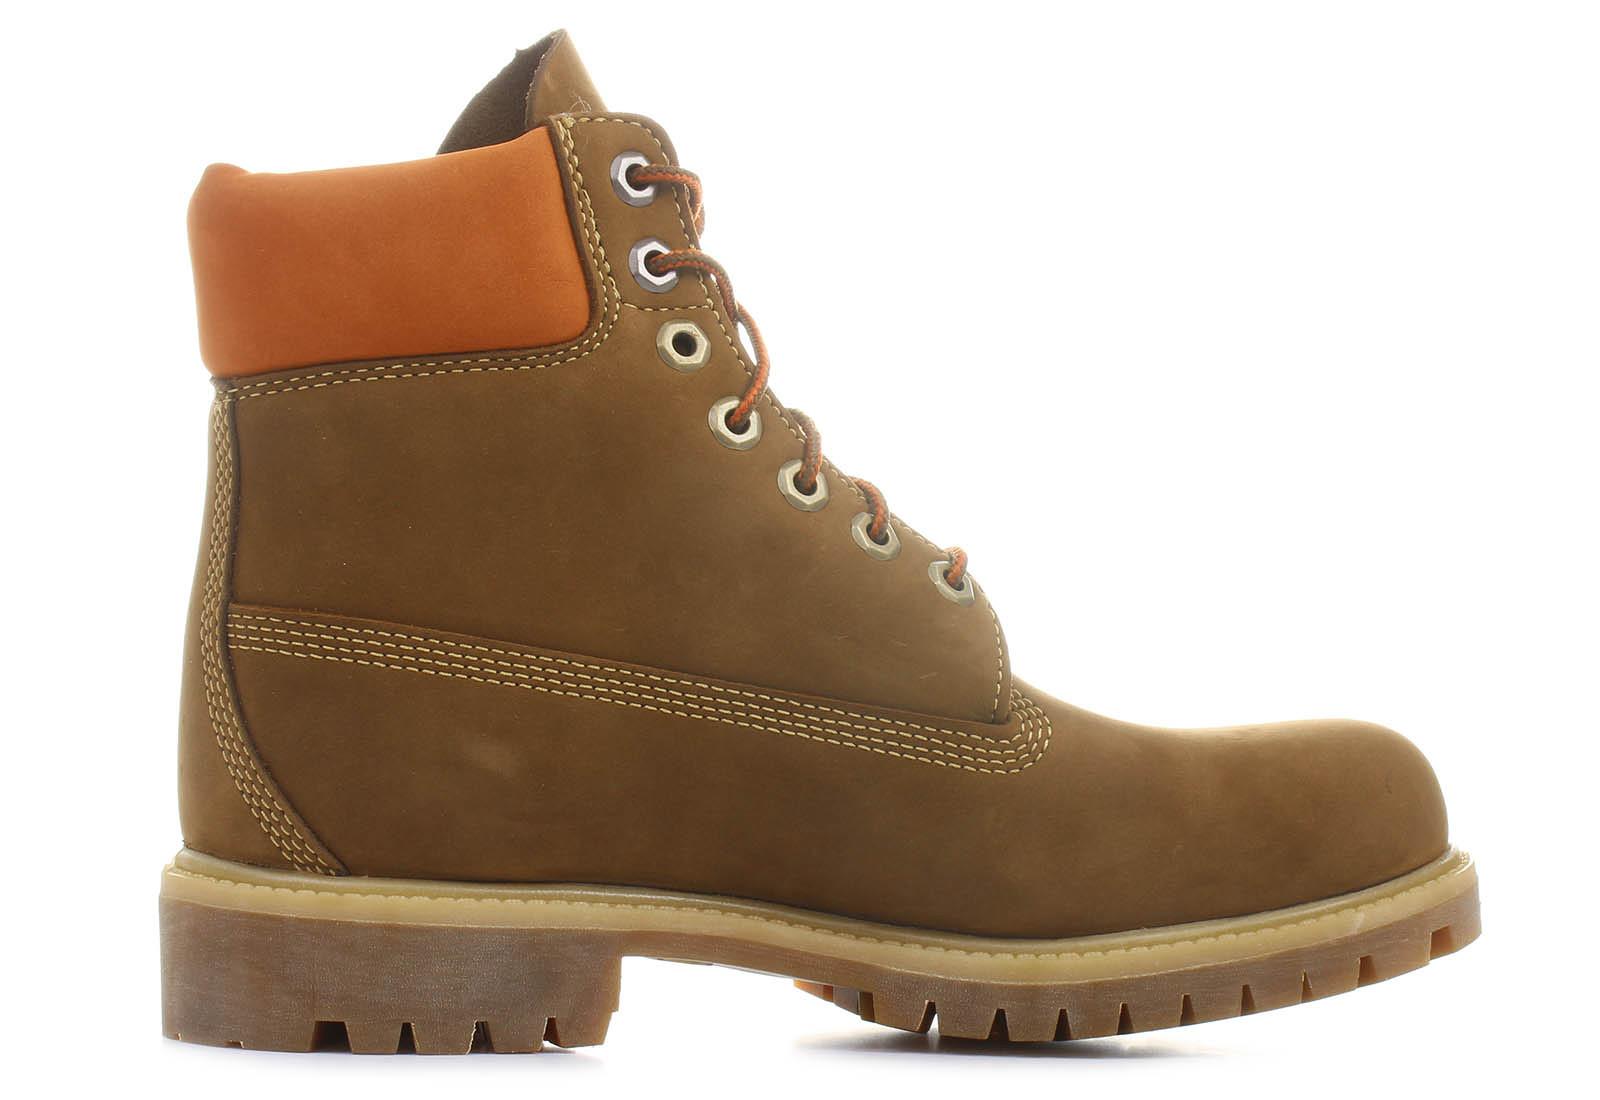 Timberland Boots 6 Inch Prem Boot A19sm Brn Online